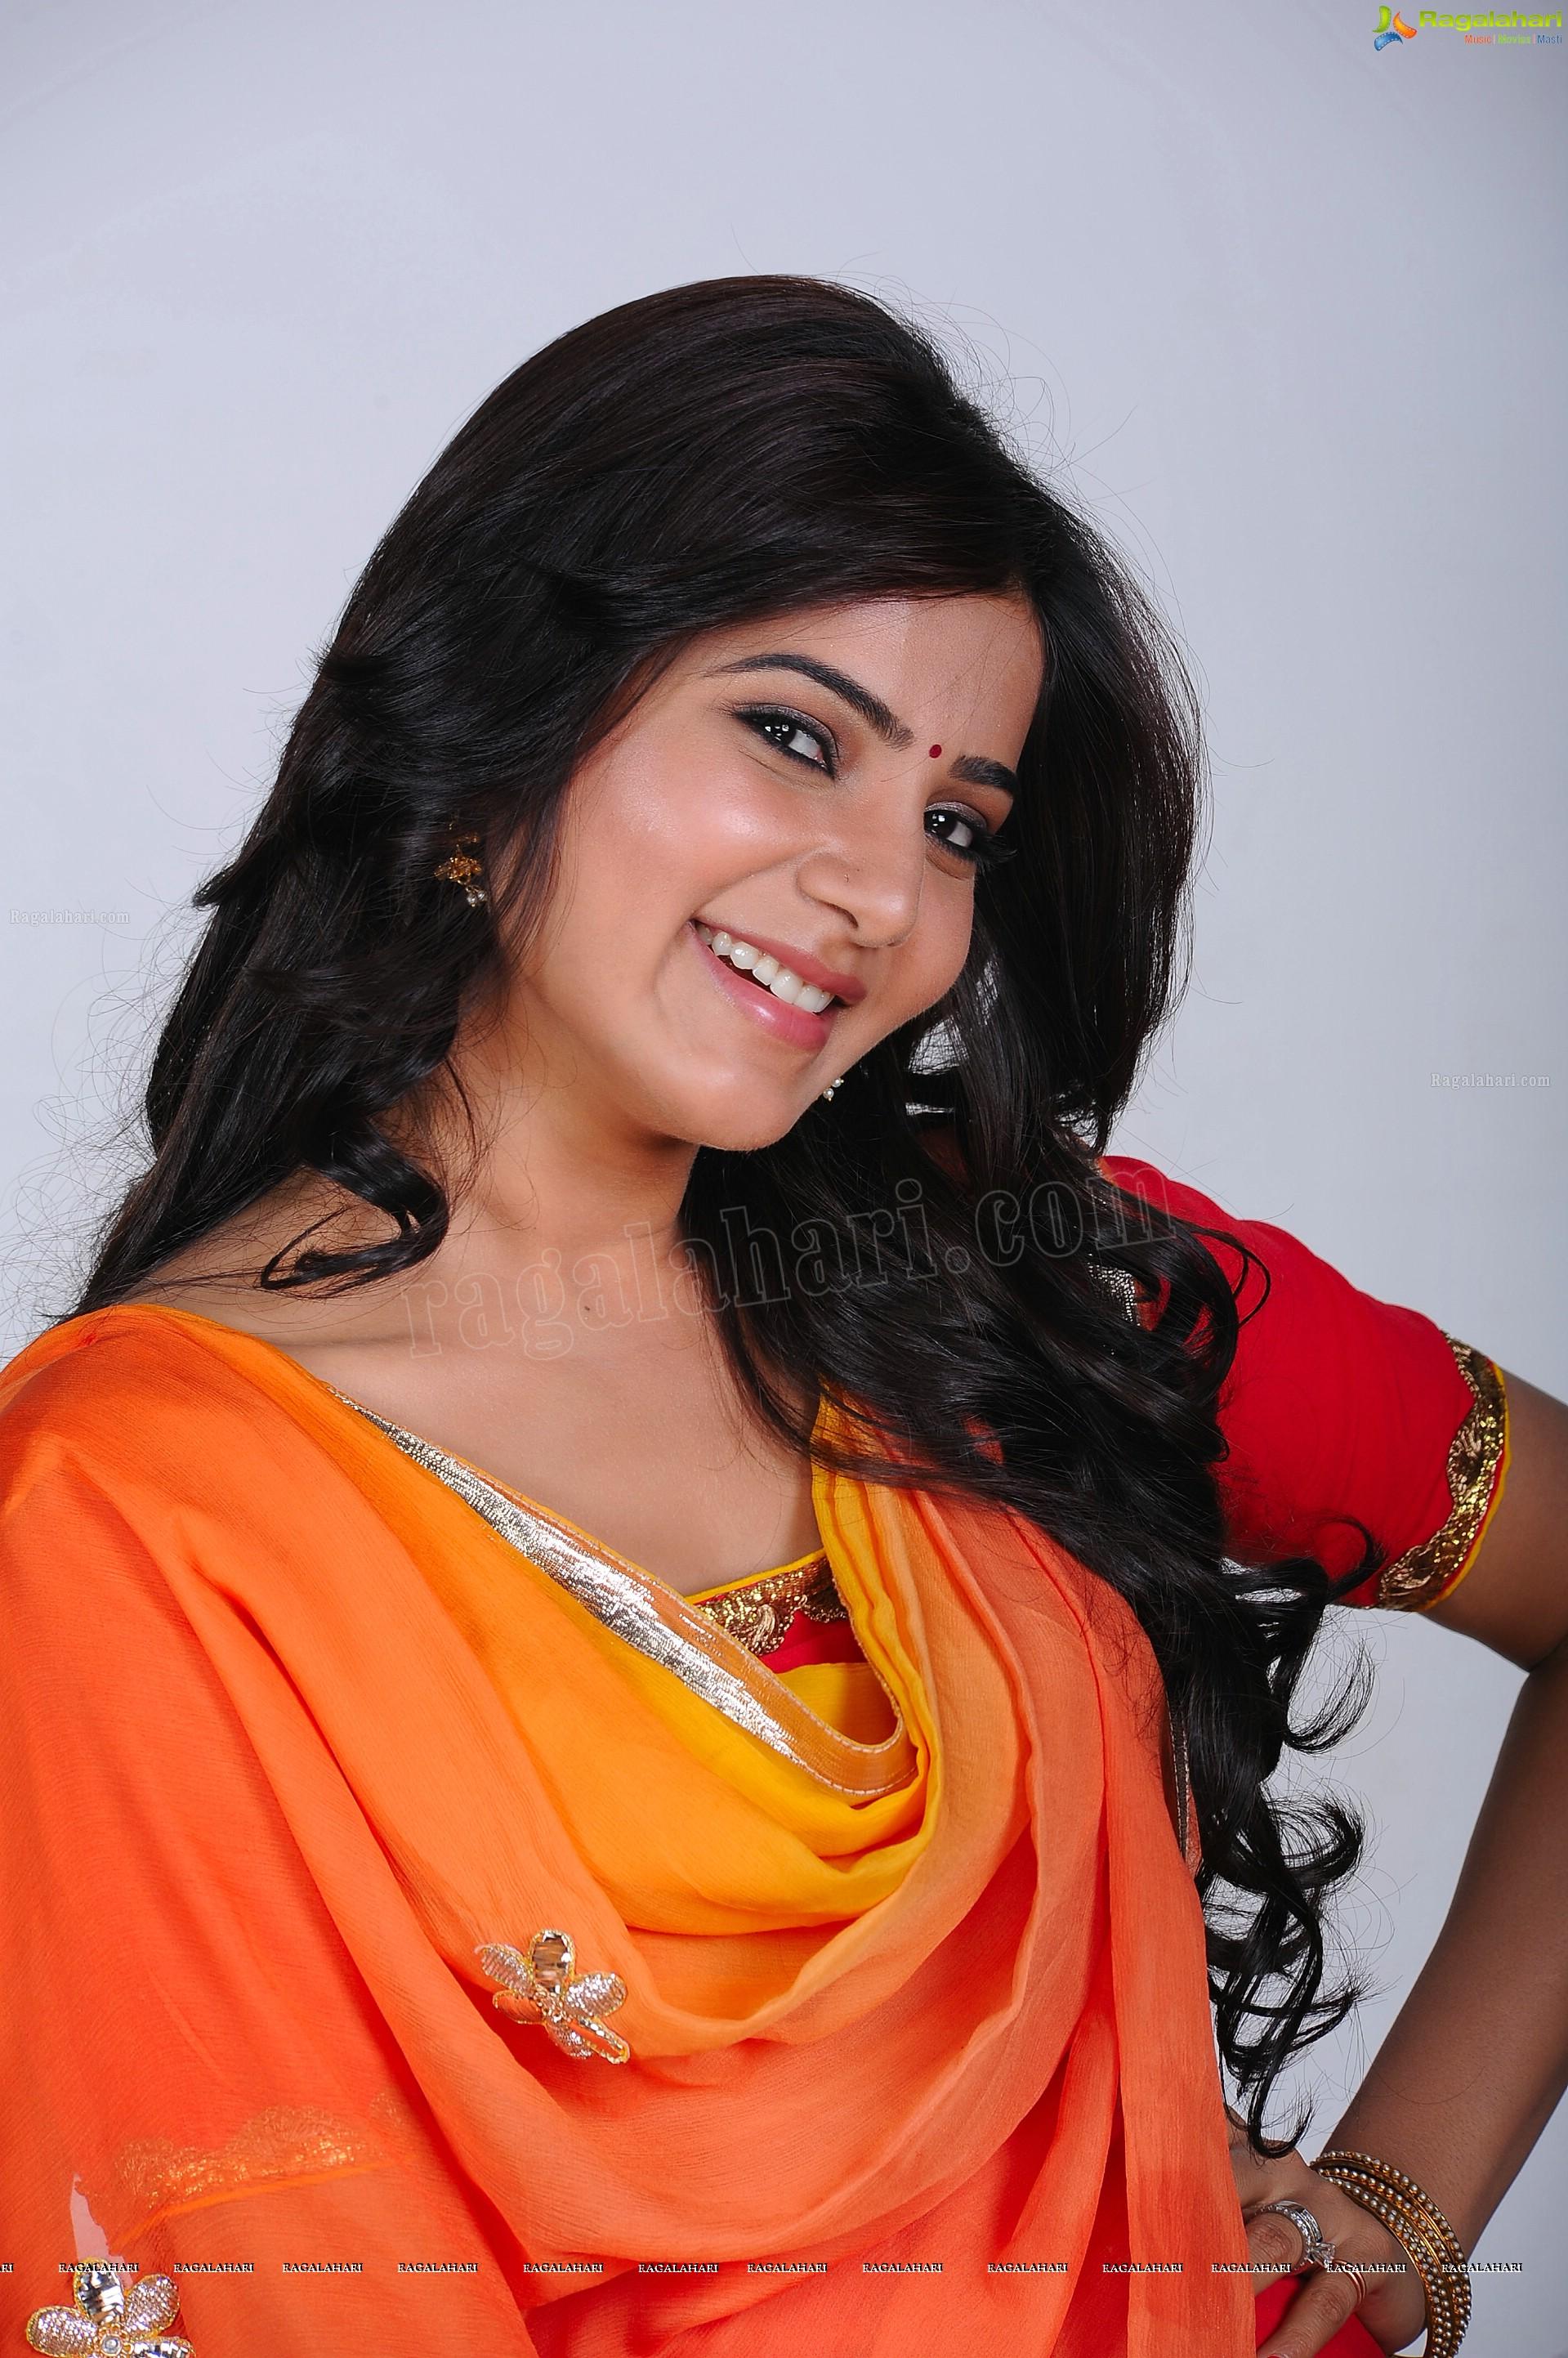 Samantha in Salwar Kameez and Sleeveless Dress - HD Gallery